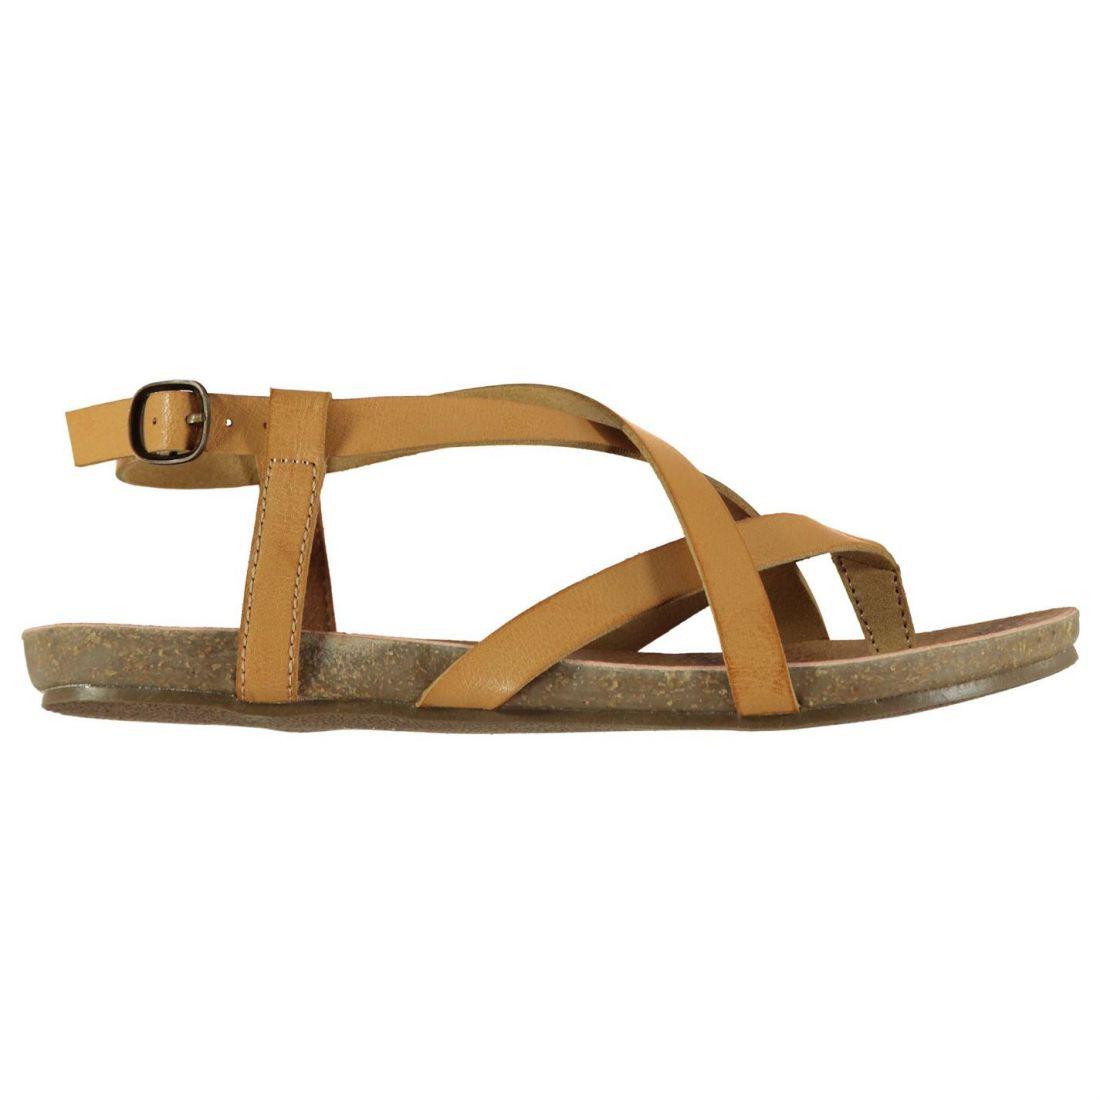 6fcbb6170 Blowfish Womens Golden Sandals Flat Buckle Fastening Strap